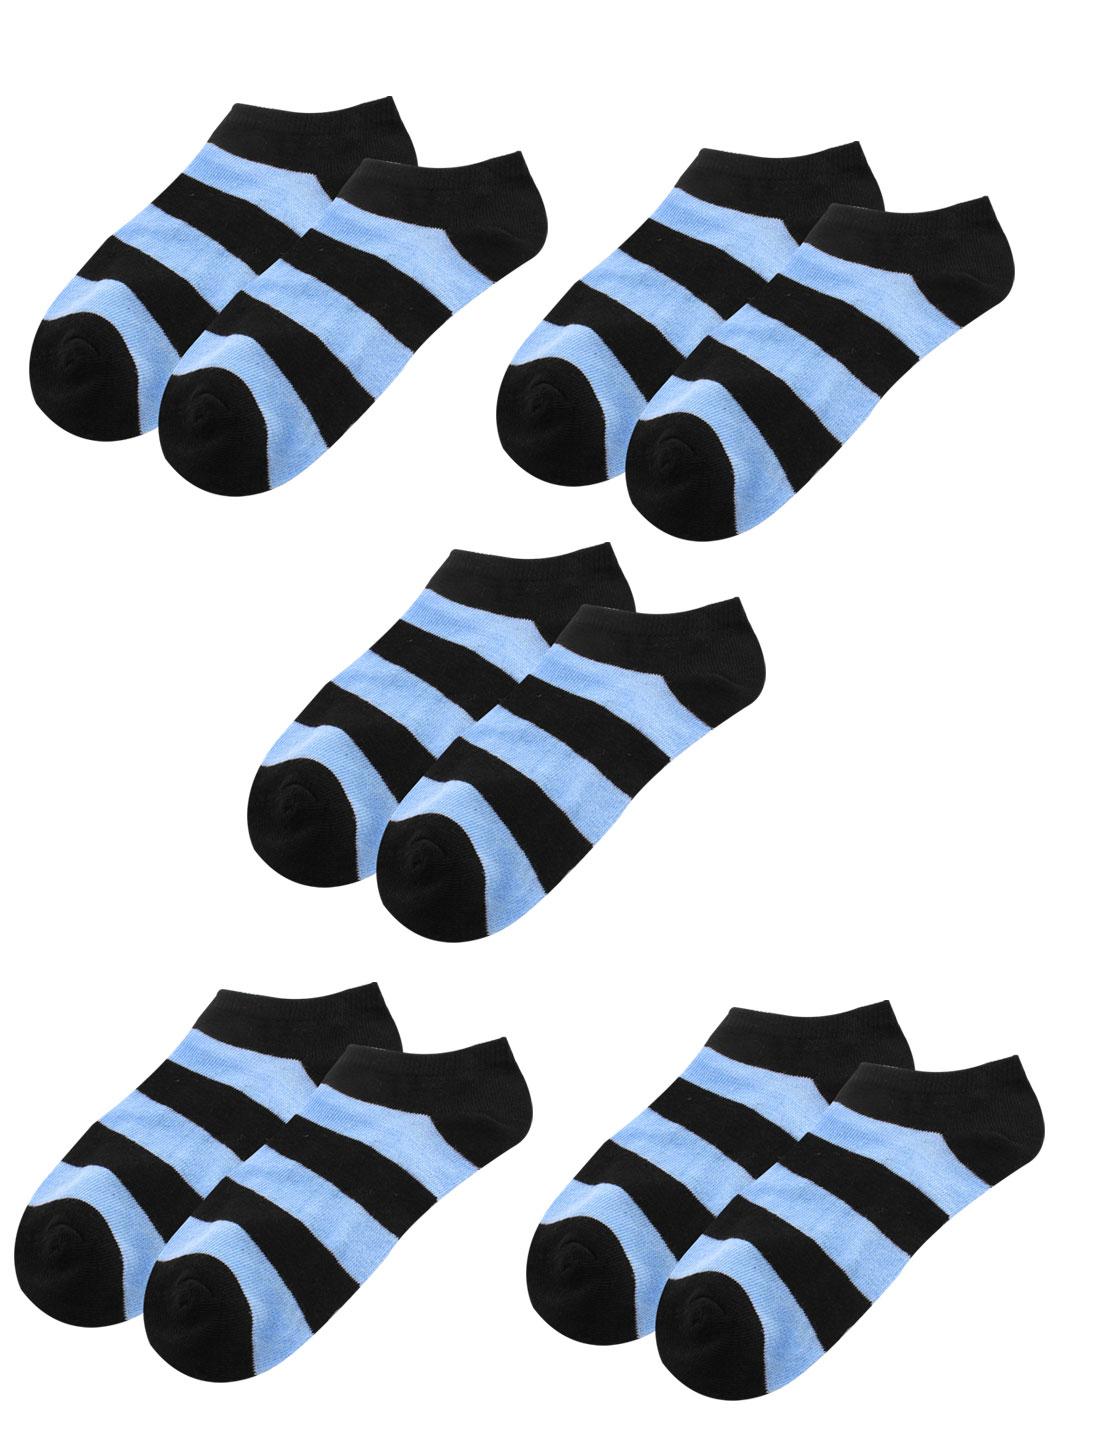 Women Strips Pattern Elastic Cotton Blends Cuff Short Socks Blue 5 Pairs